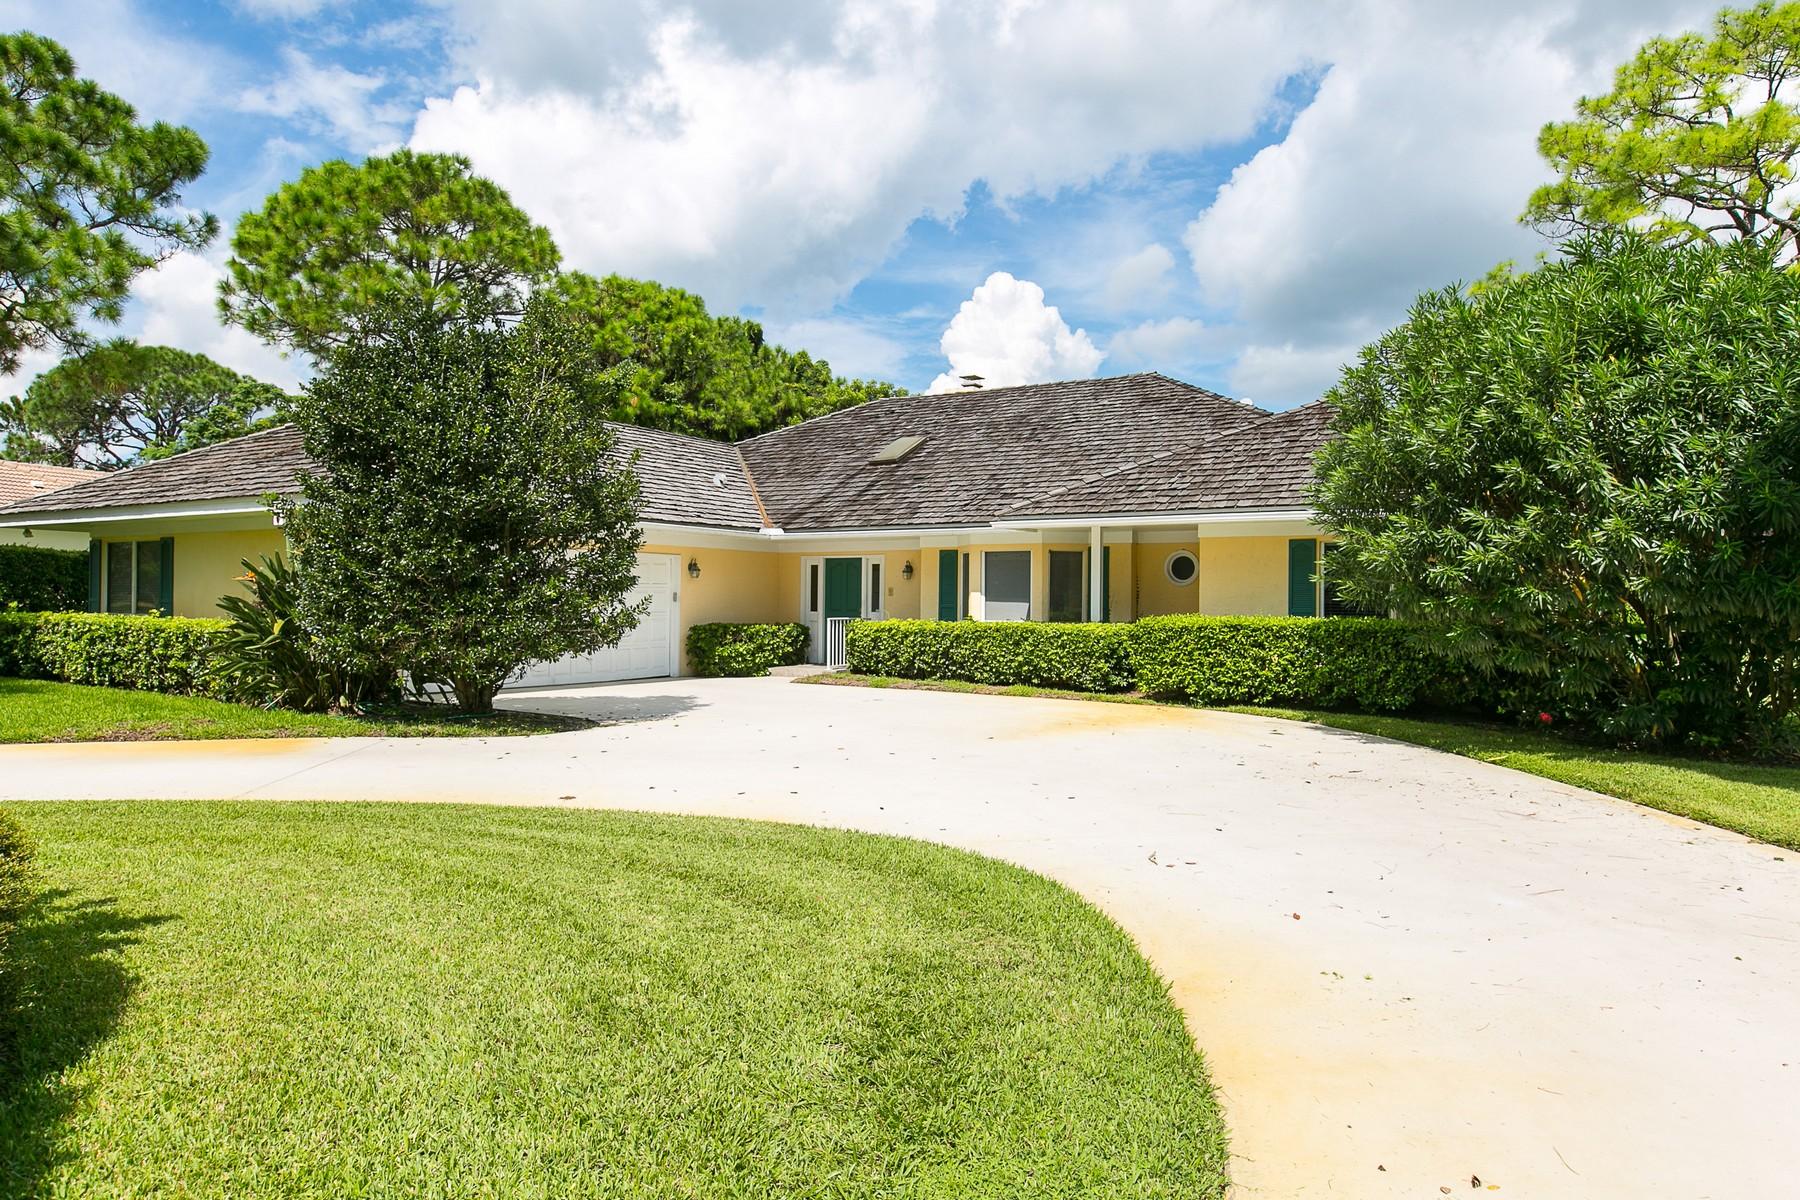 Moradia para Venda às Bent Pine Golf Club 5825 Glen Eagle Lane Vero Beach, Florida, 32967 Estados Unidos